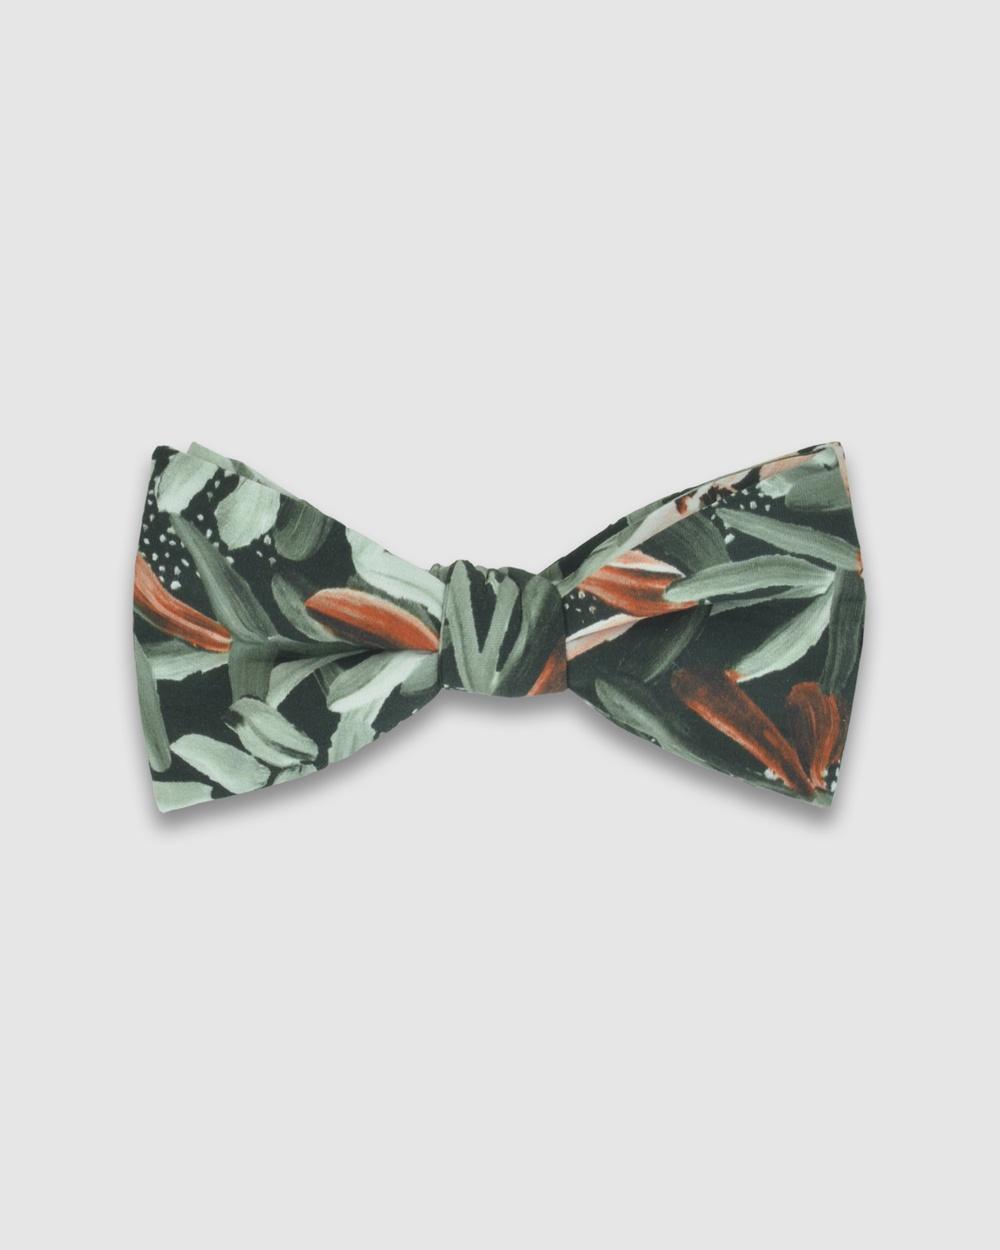 Peggy and Finn Protea Bow Tie Ties & Cufflinks Green Australia